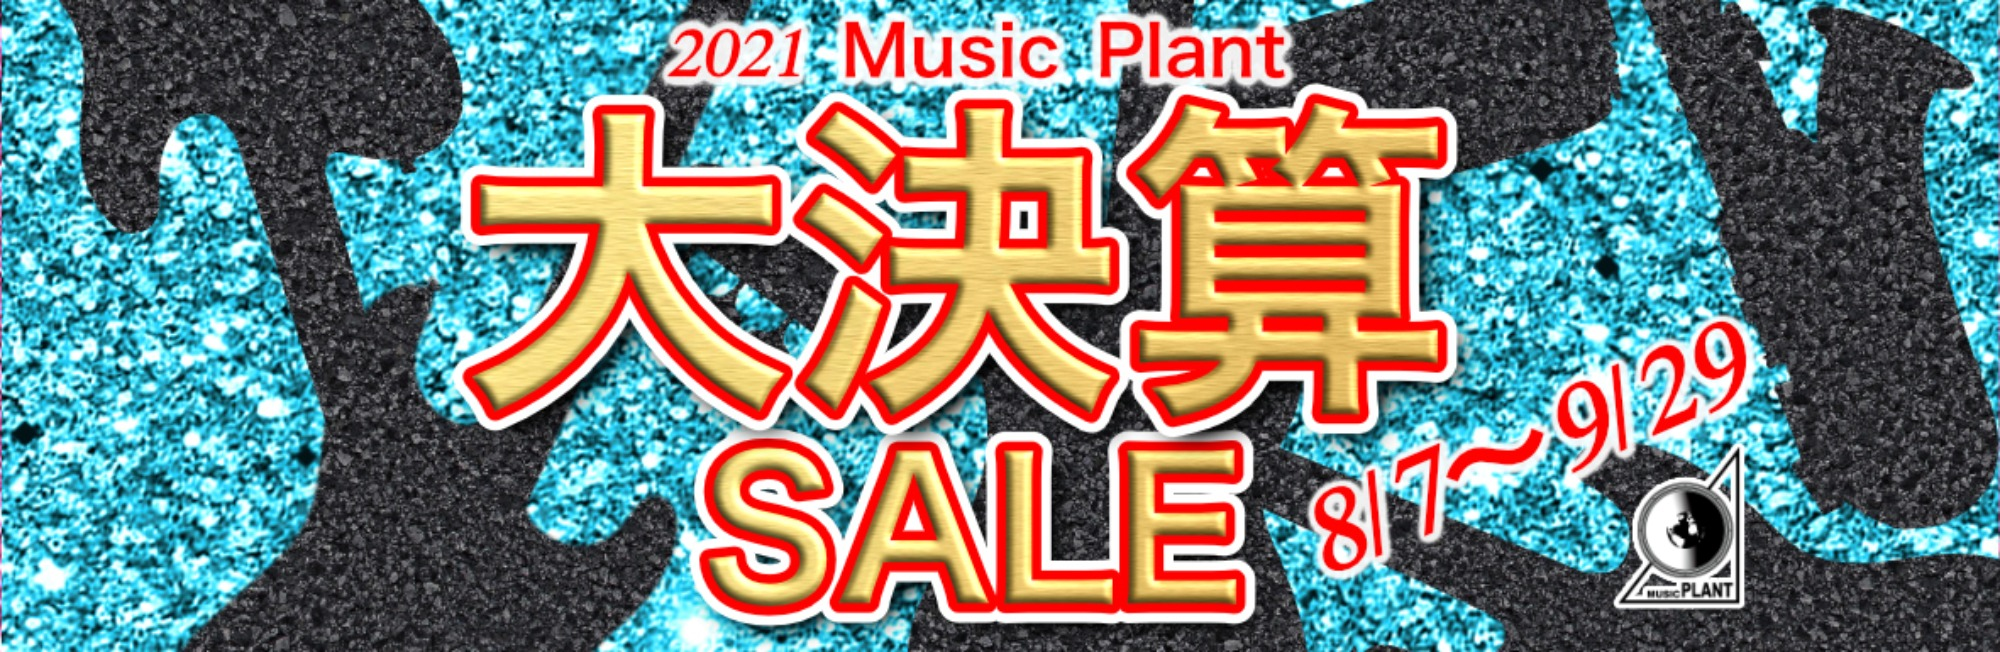 2021 MUSIC PLANT LAST SALE